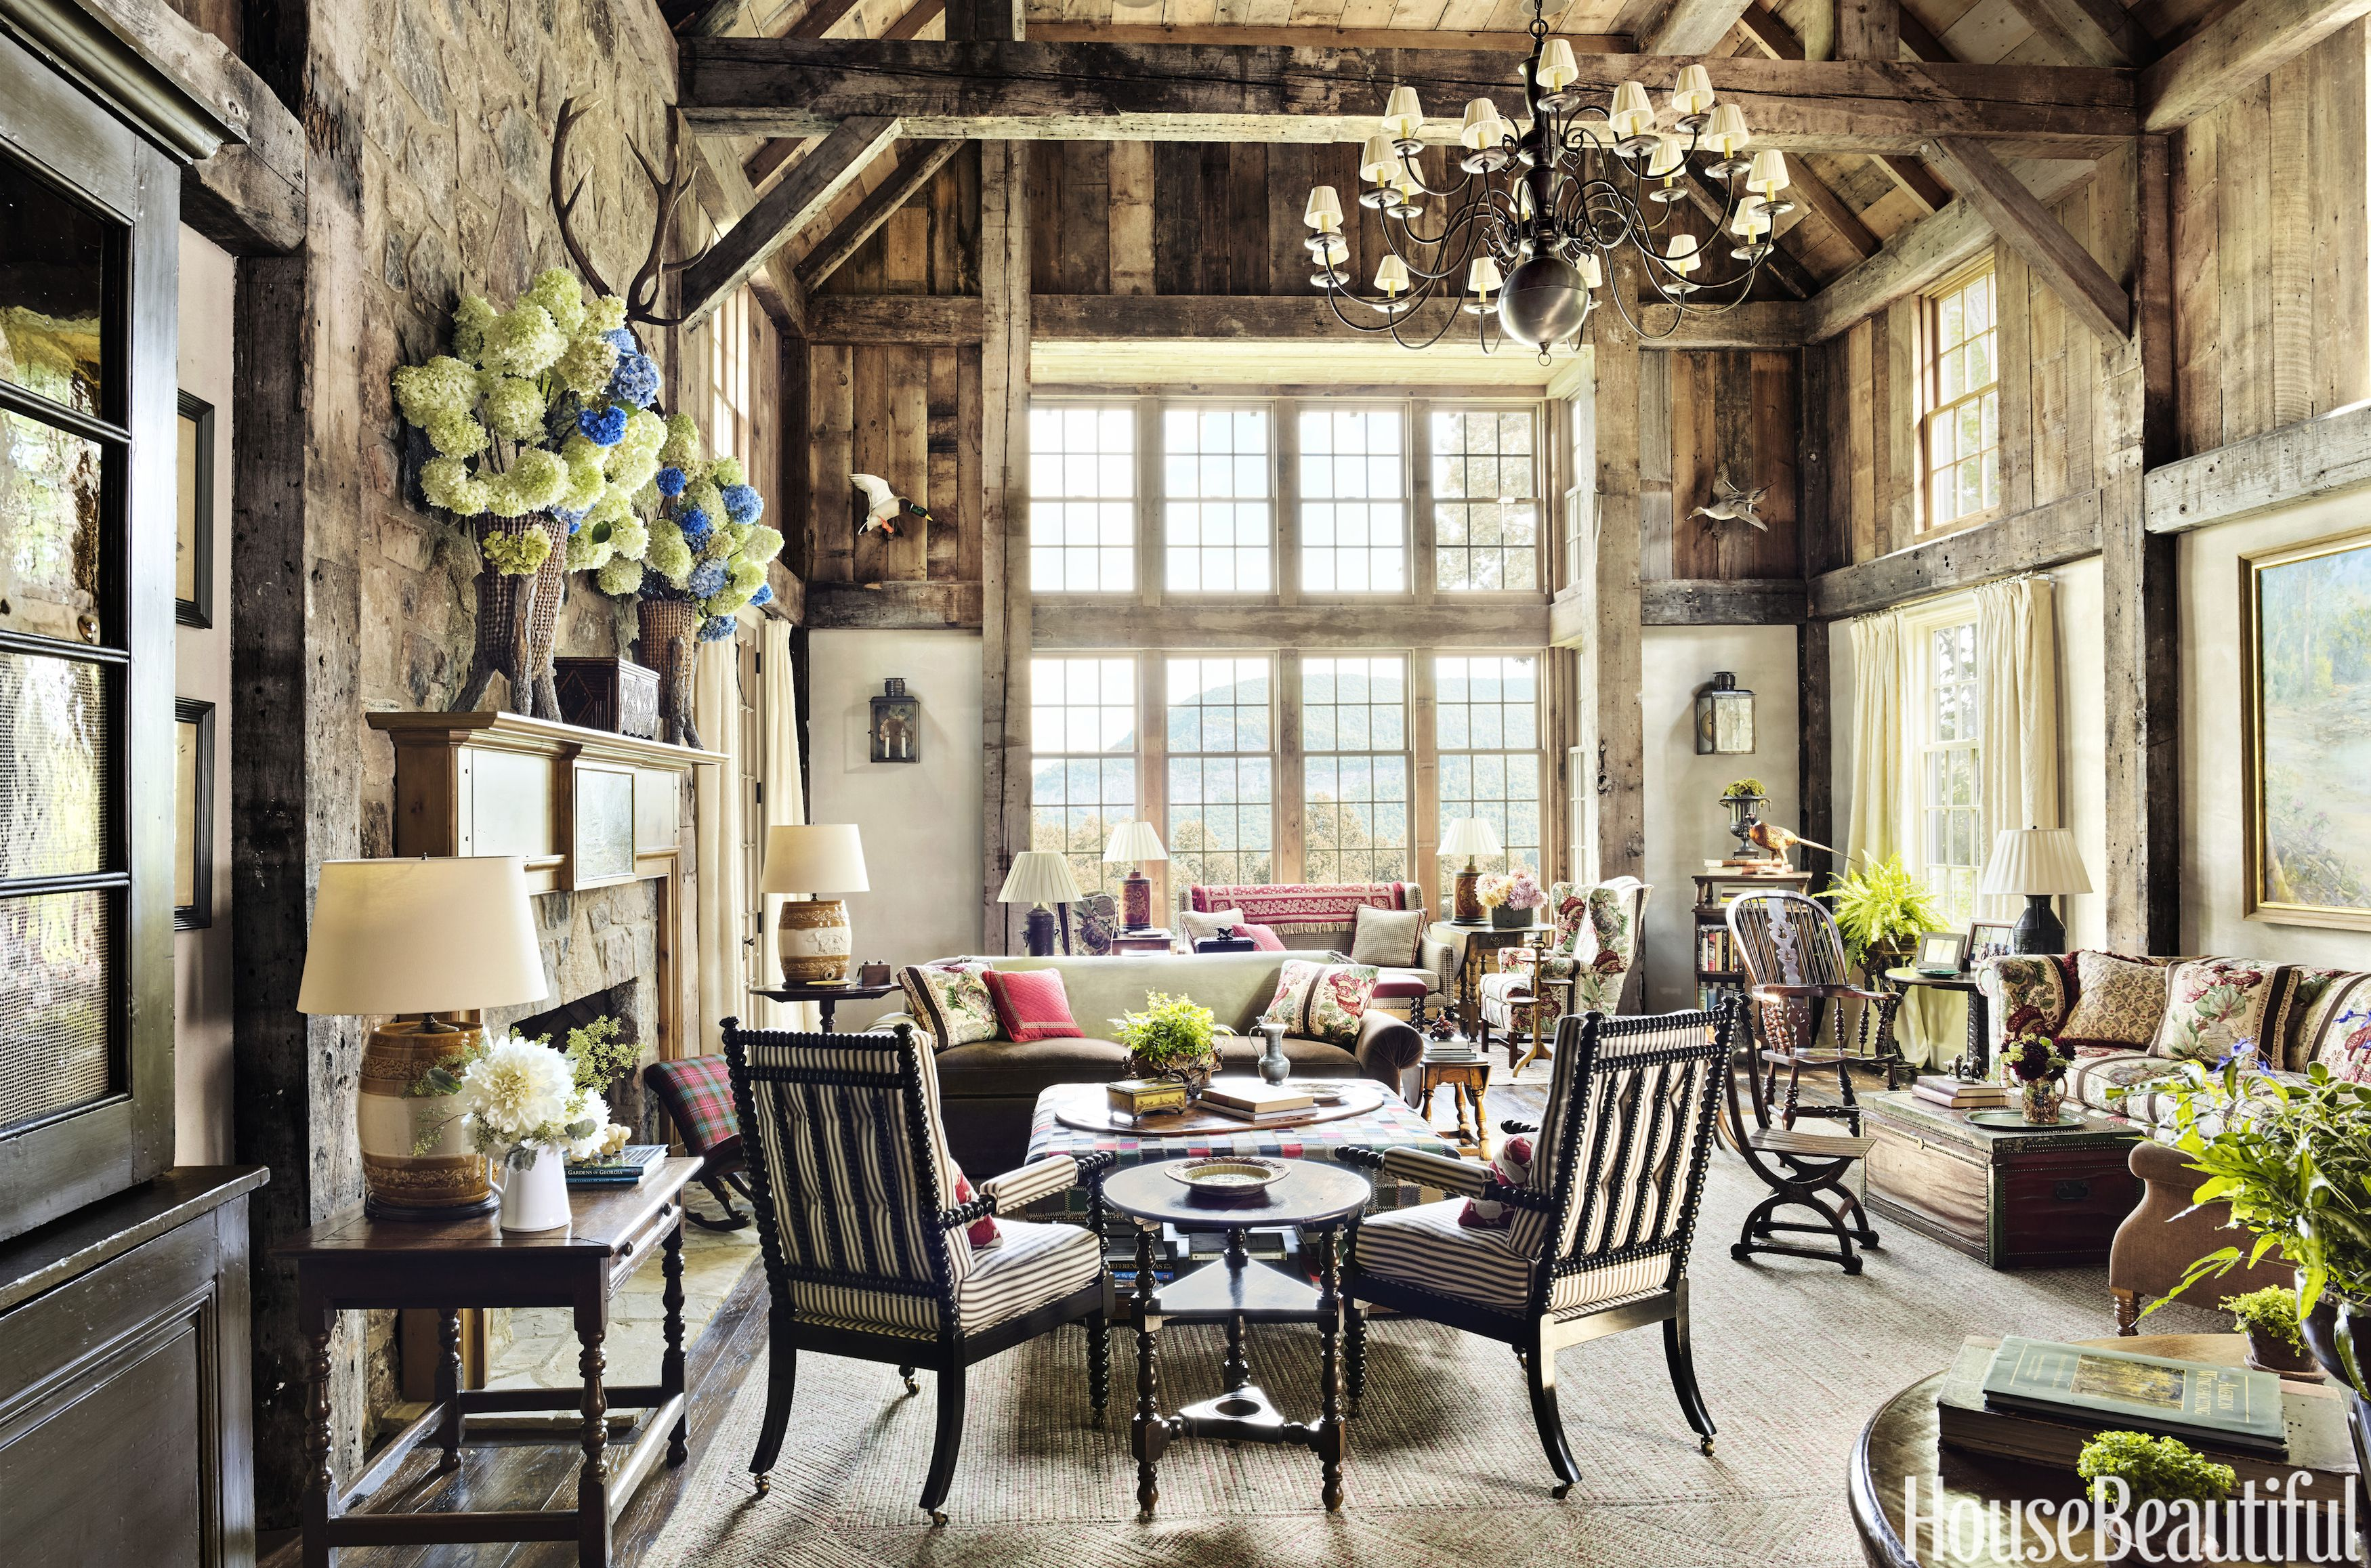 Image. Annie Schlechter. Mountain Living Room